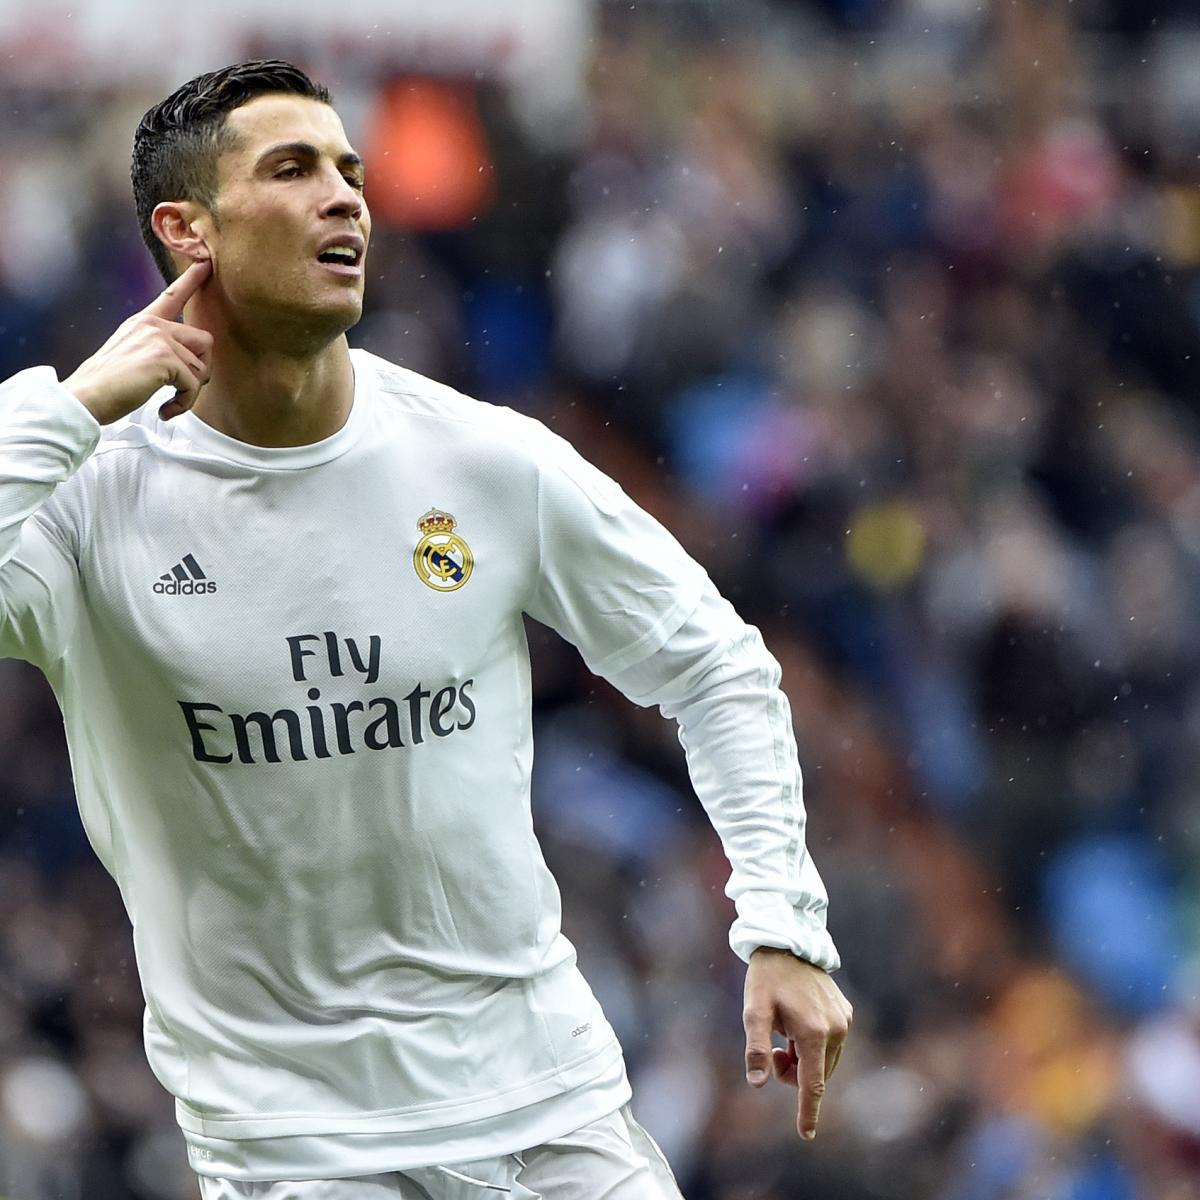 Cristiano Ronaldo S 4 Goals Lead Real Madrid To Win Vs: Real Madrid Vs. Celta Vigo: Score, Reaction From 2016 La